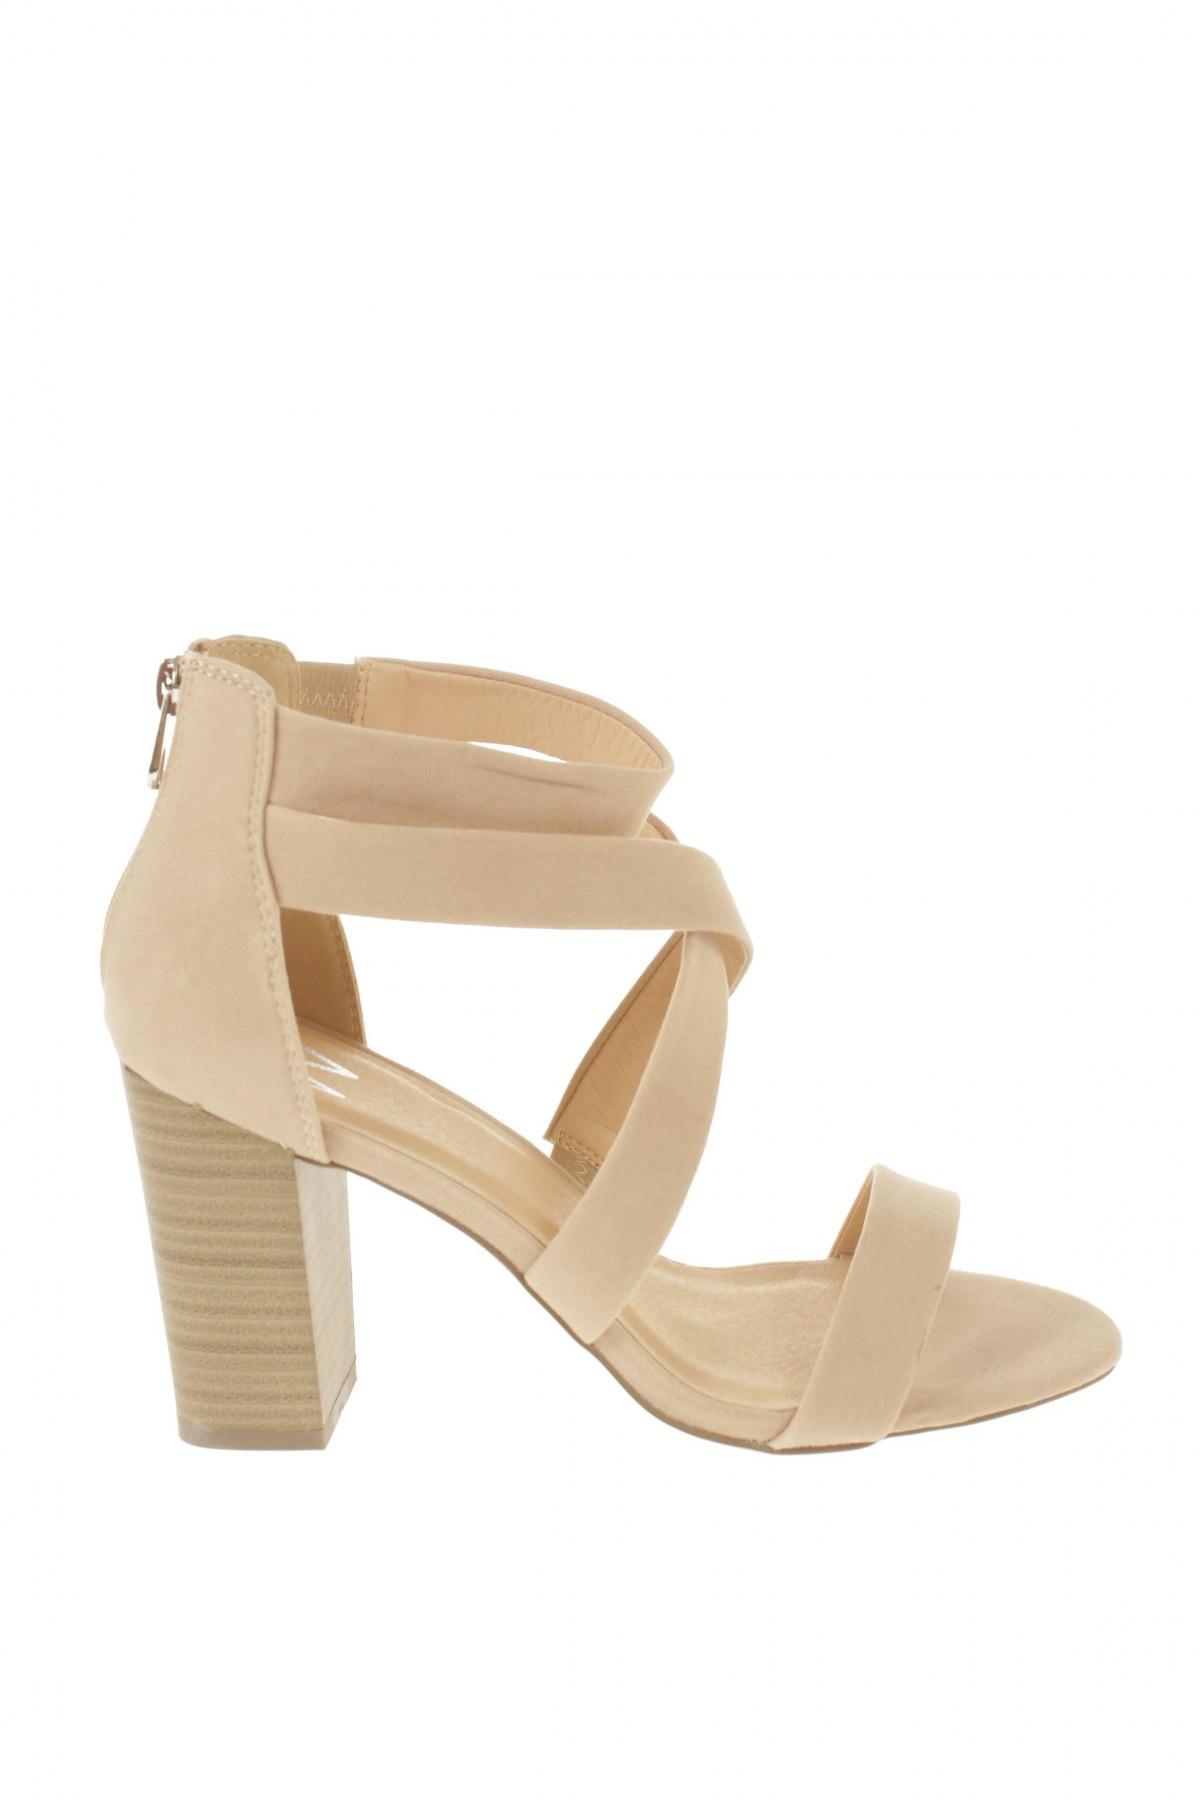 4b28a59e3aa1 Sandale W Collection - la preț avantajos pe Remix -  102003110